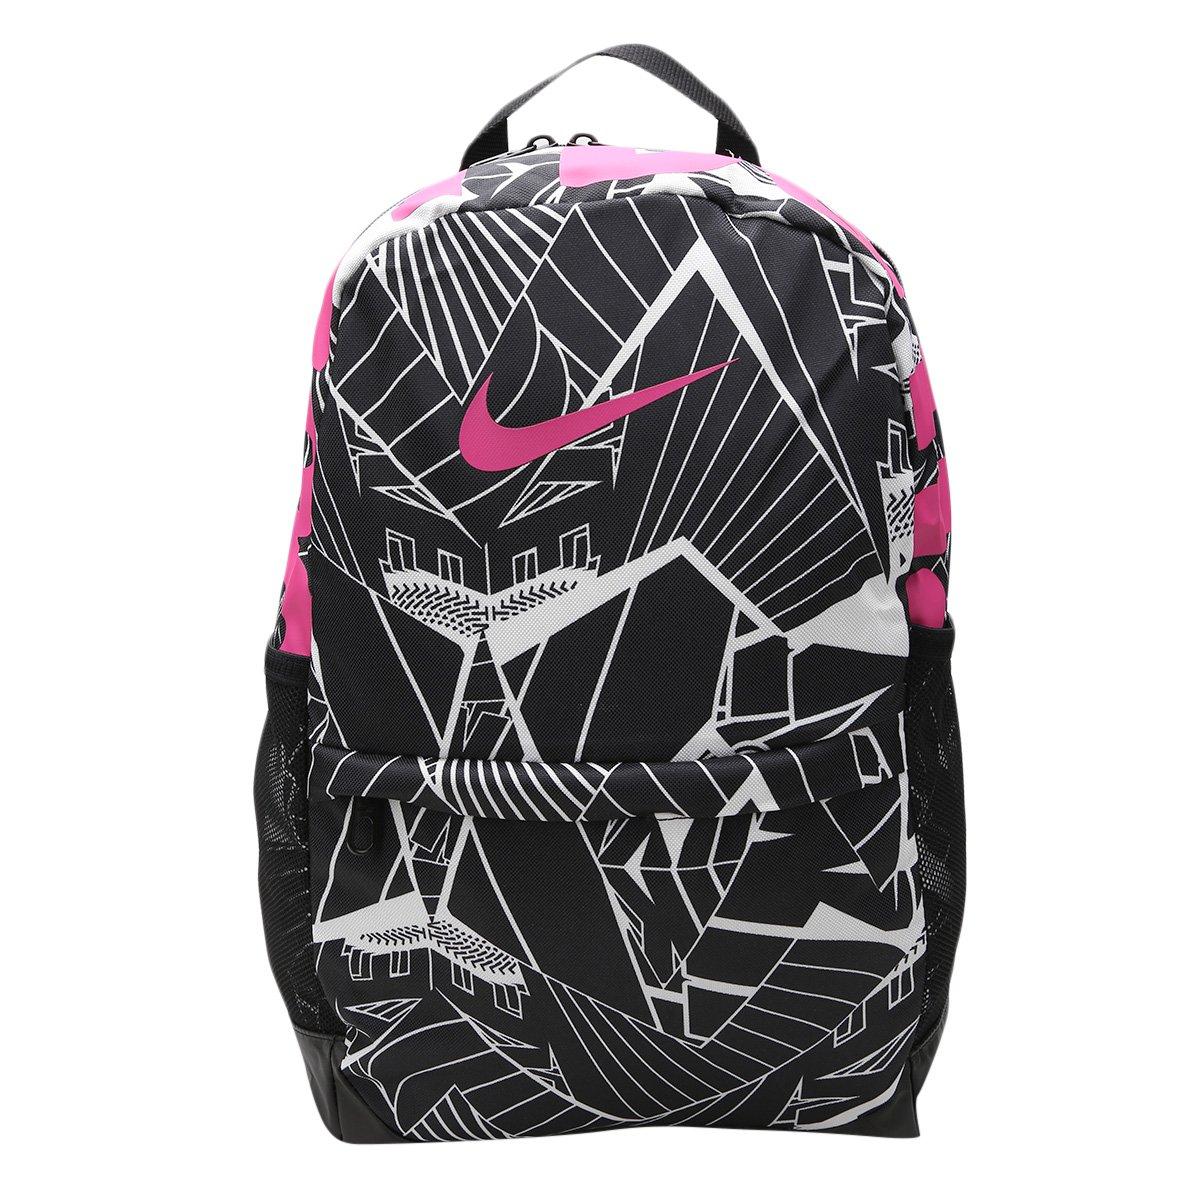 Preto E Do Nike It Compre Masculina Mochila Just Infantil Pink qjGLSVUMzp